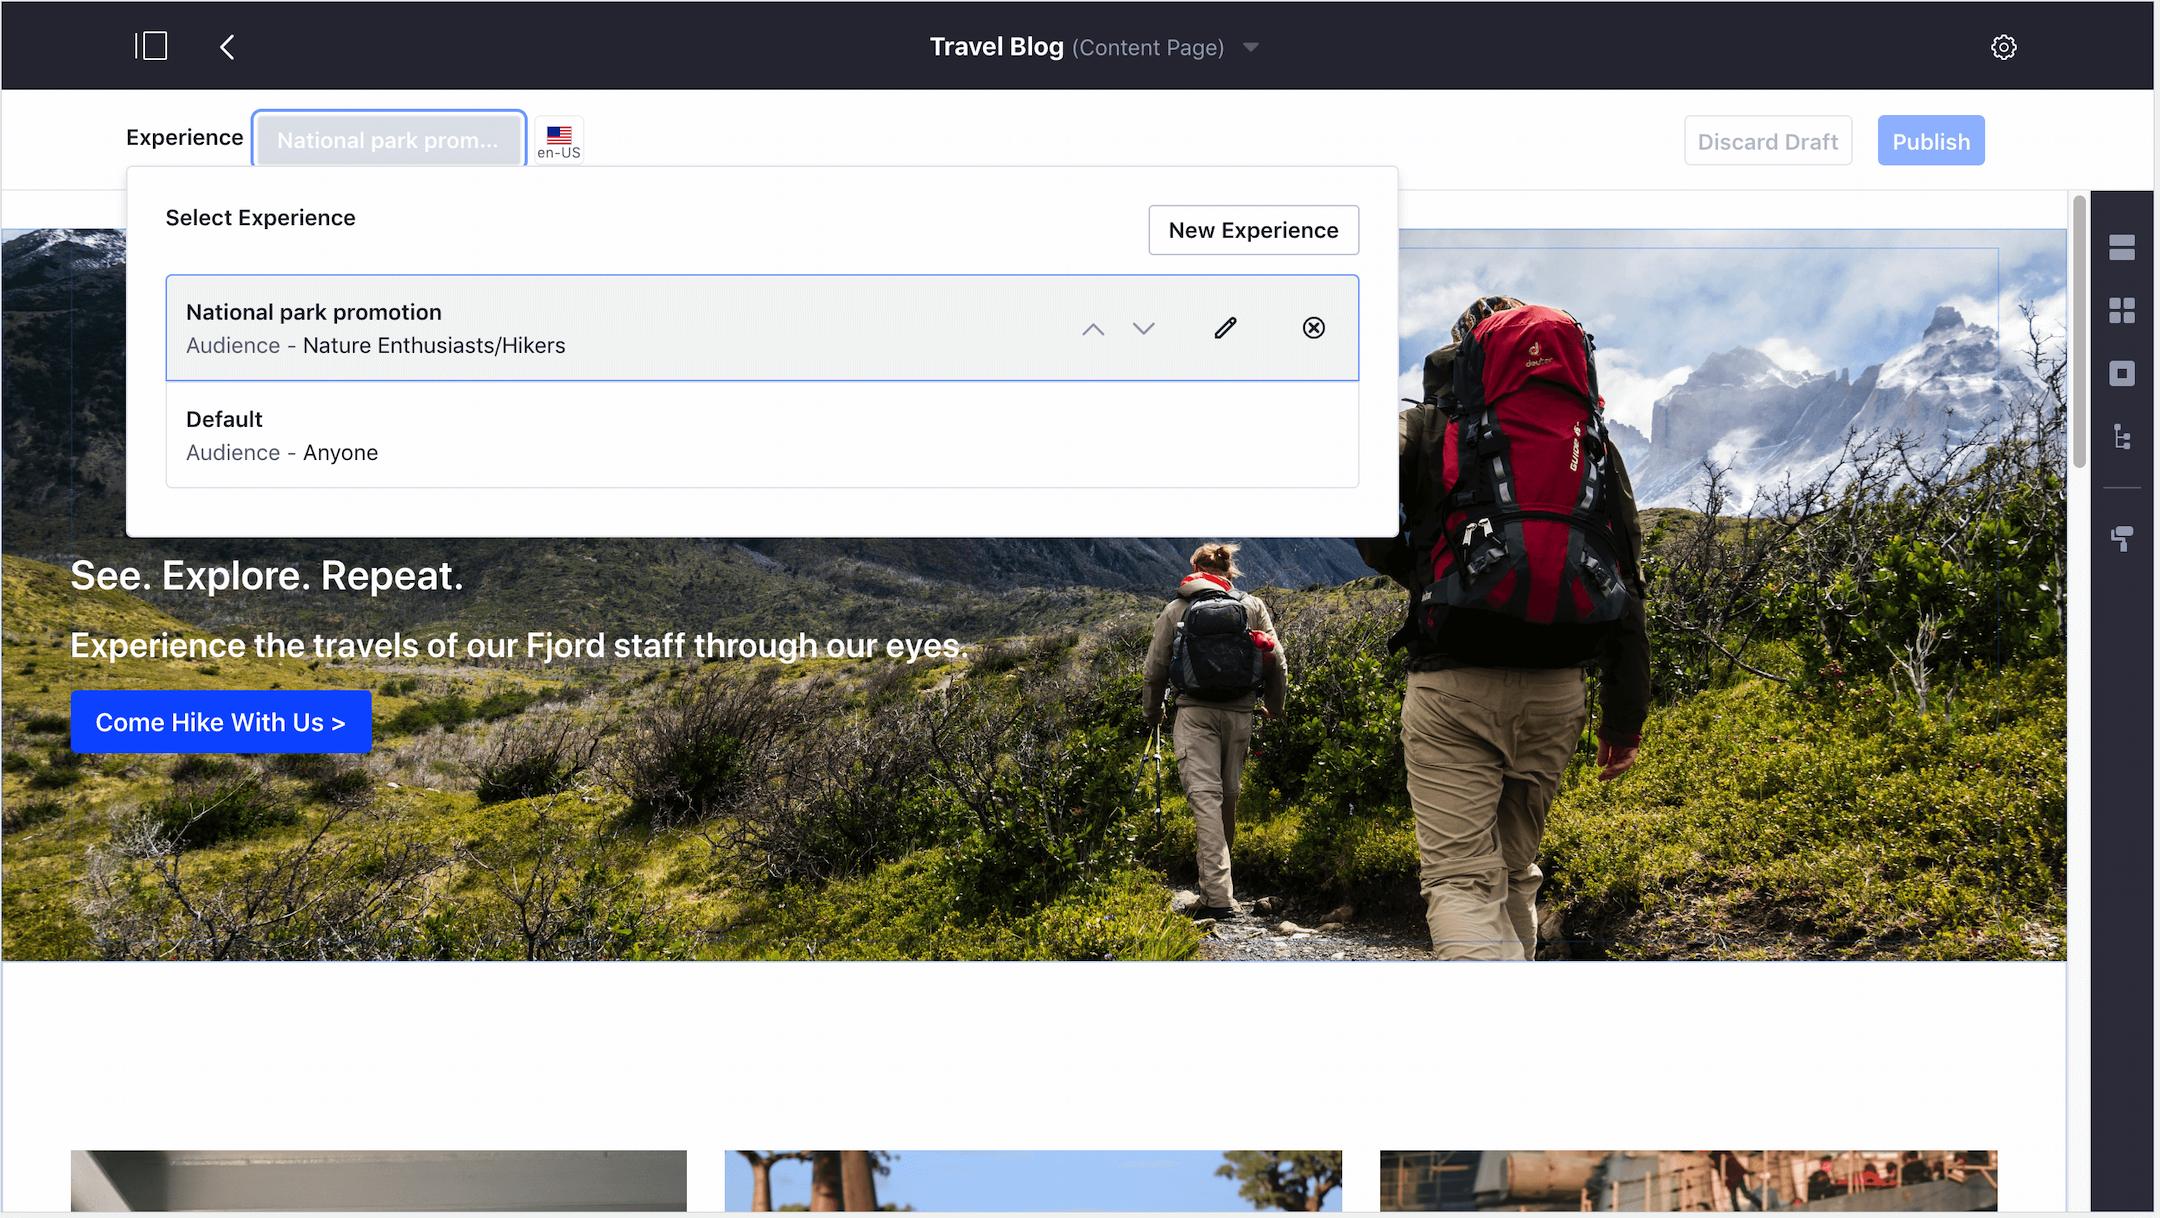 Liferay Digital Experience Platform Reviews 2019: Details